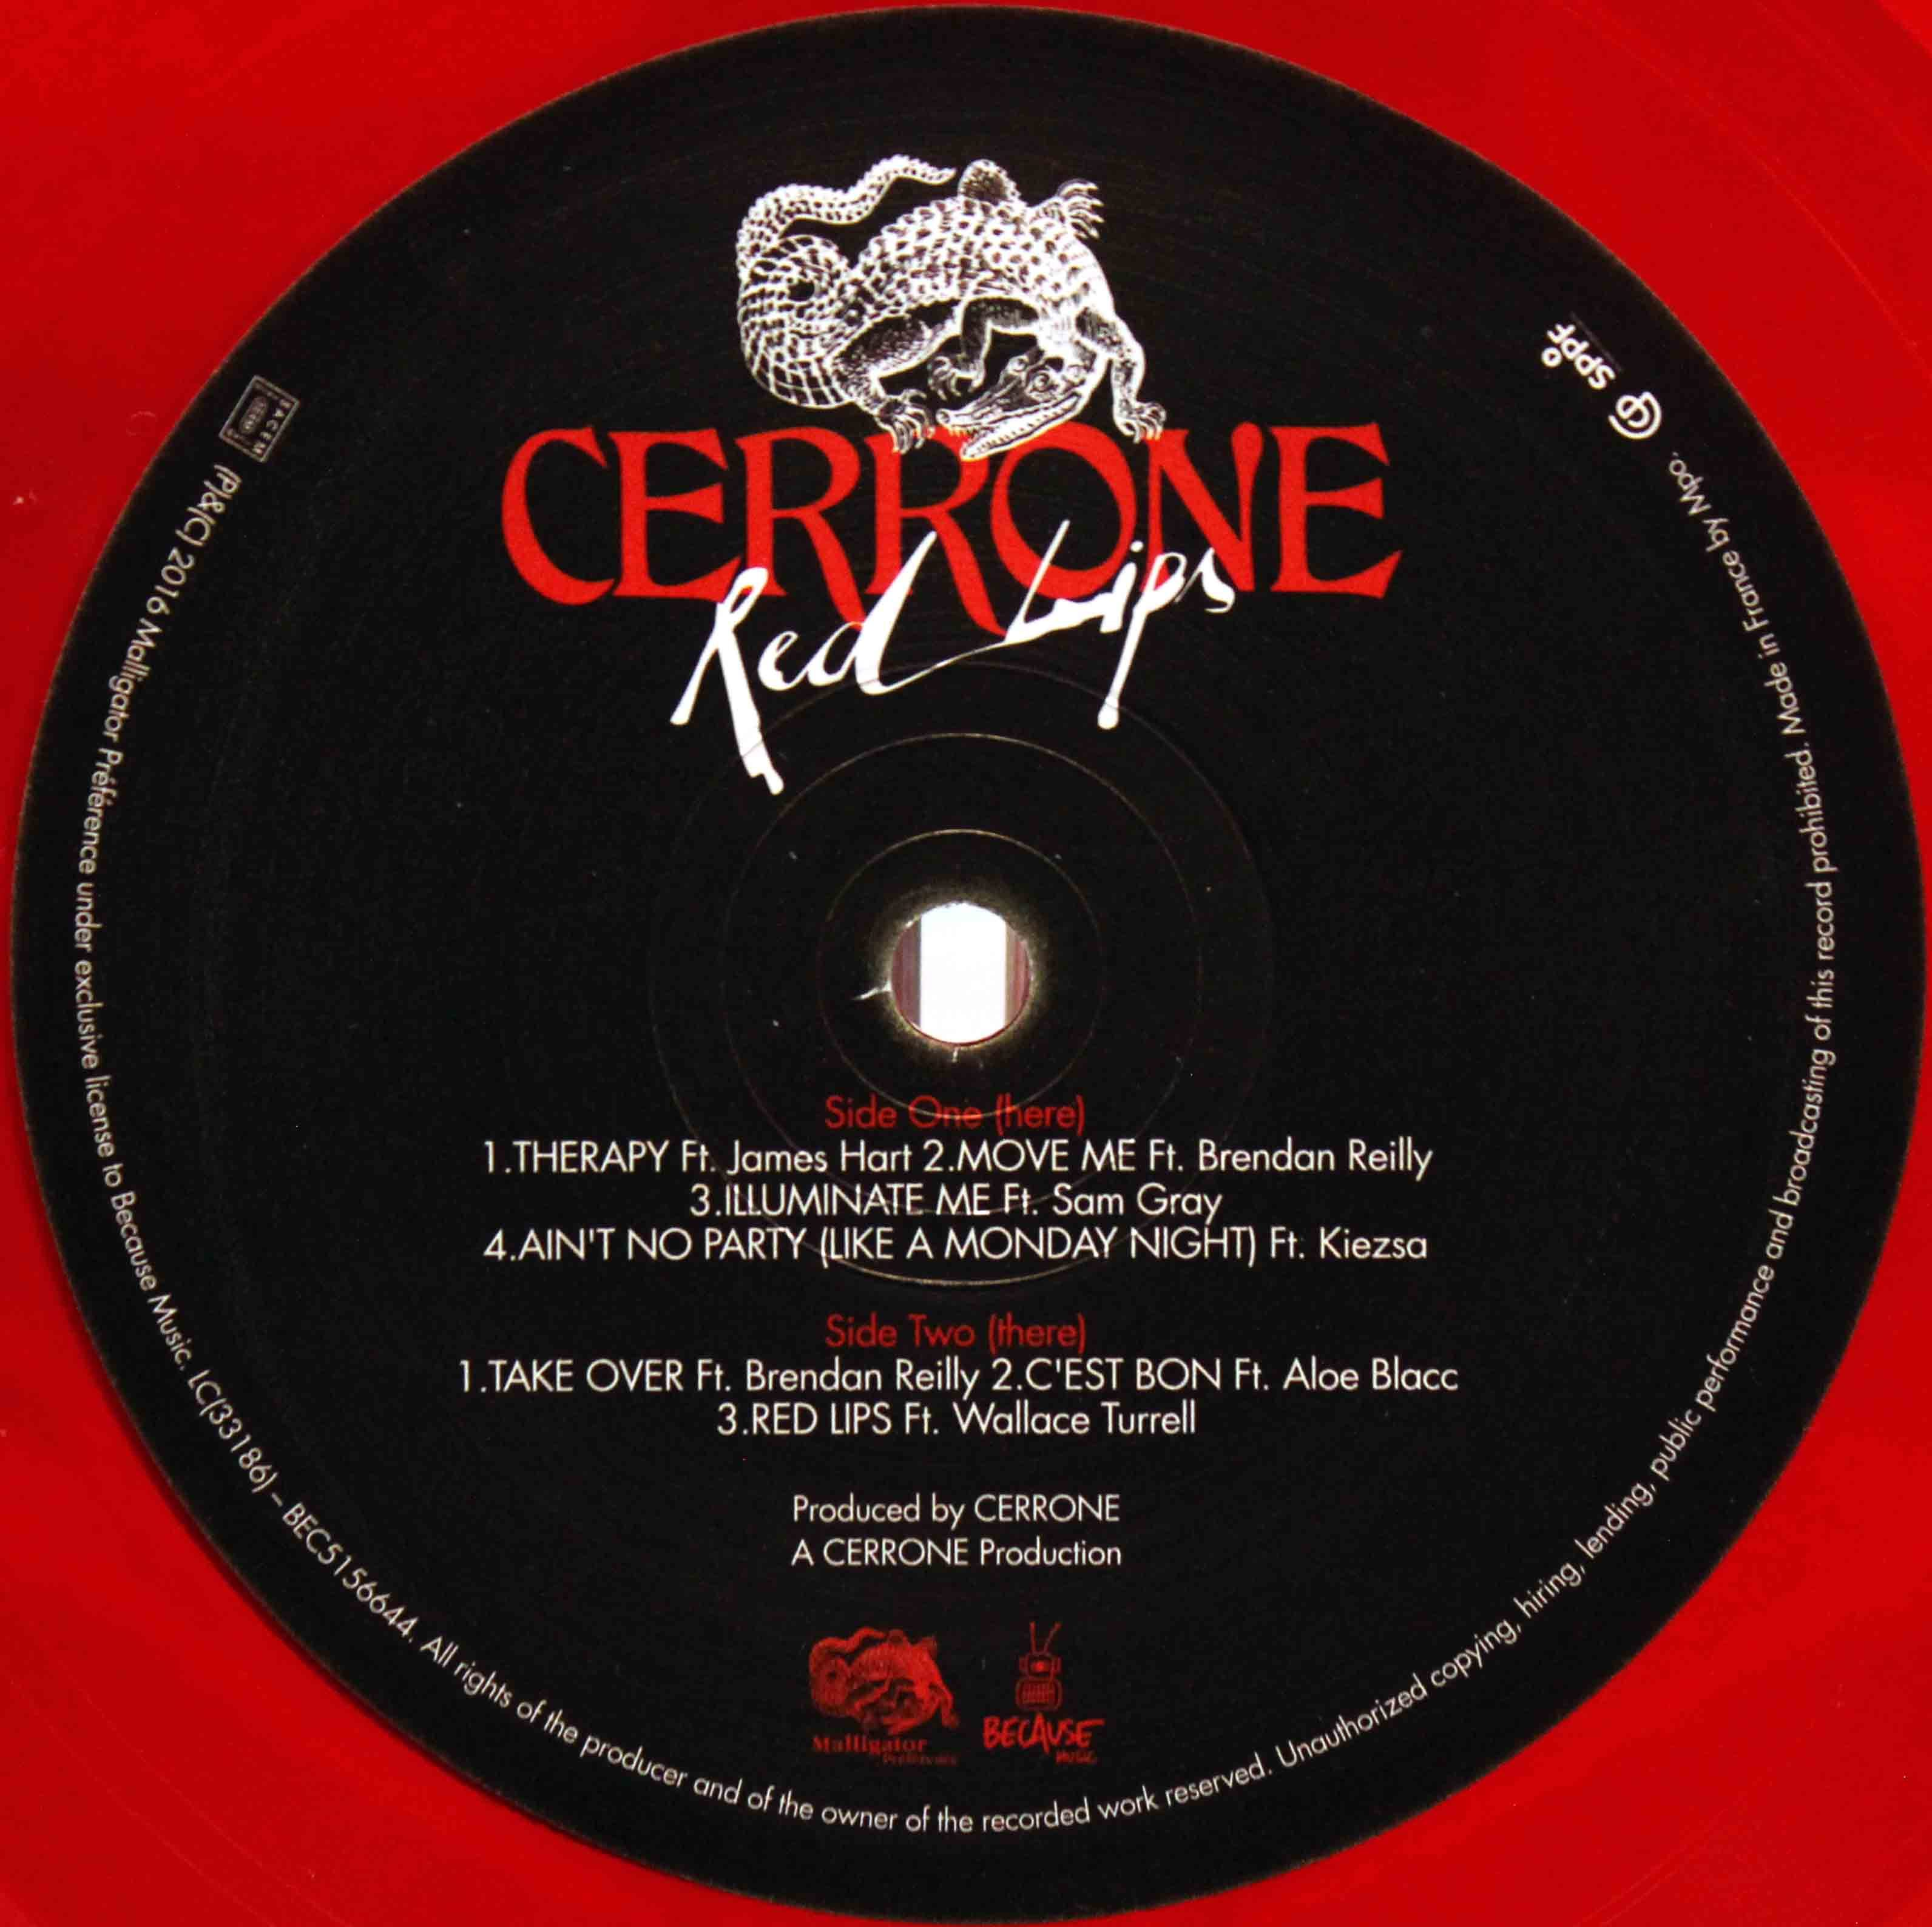 Cerrone (2018) – Red Lips 03